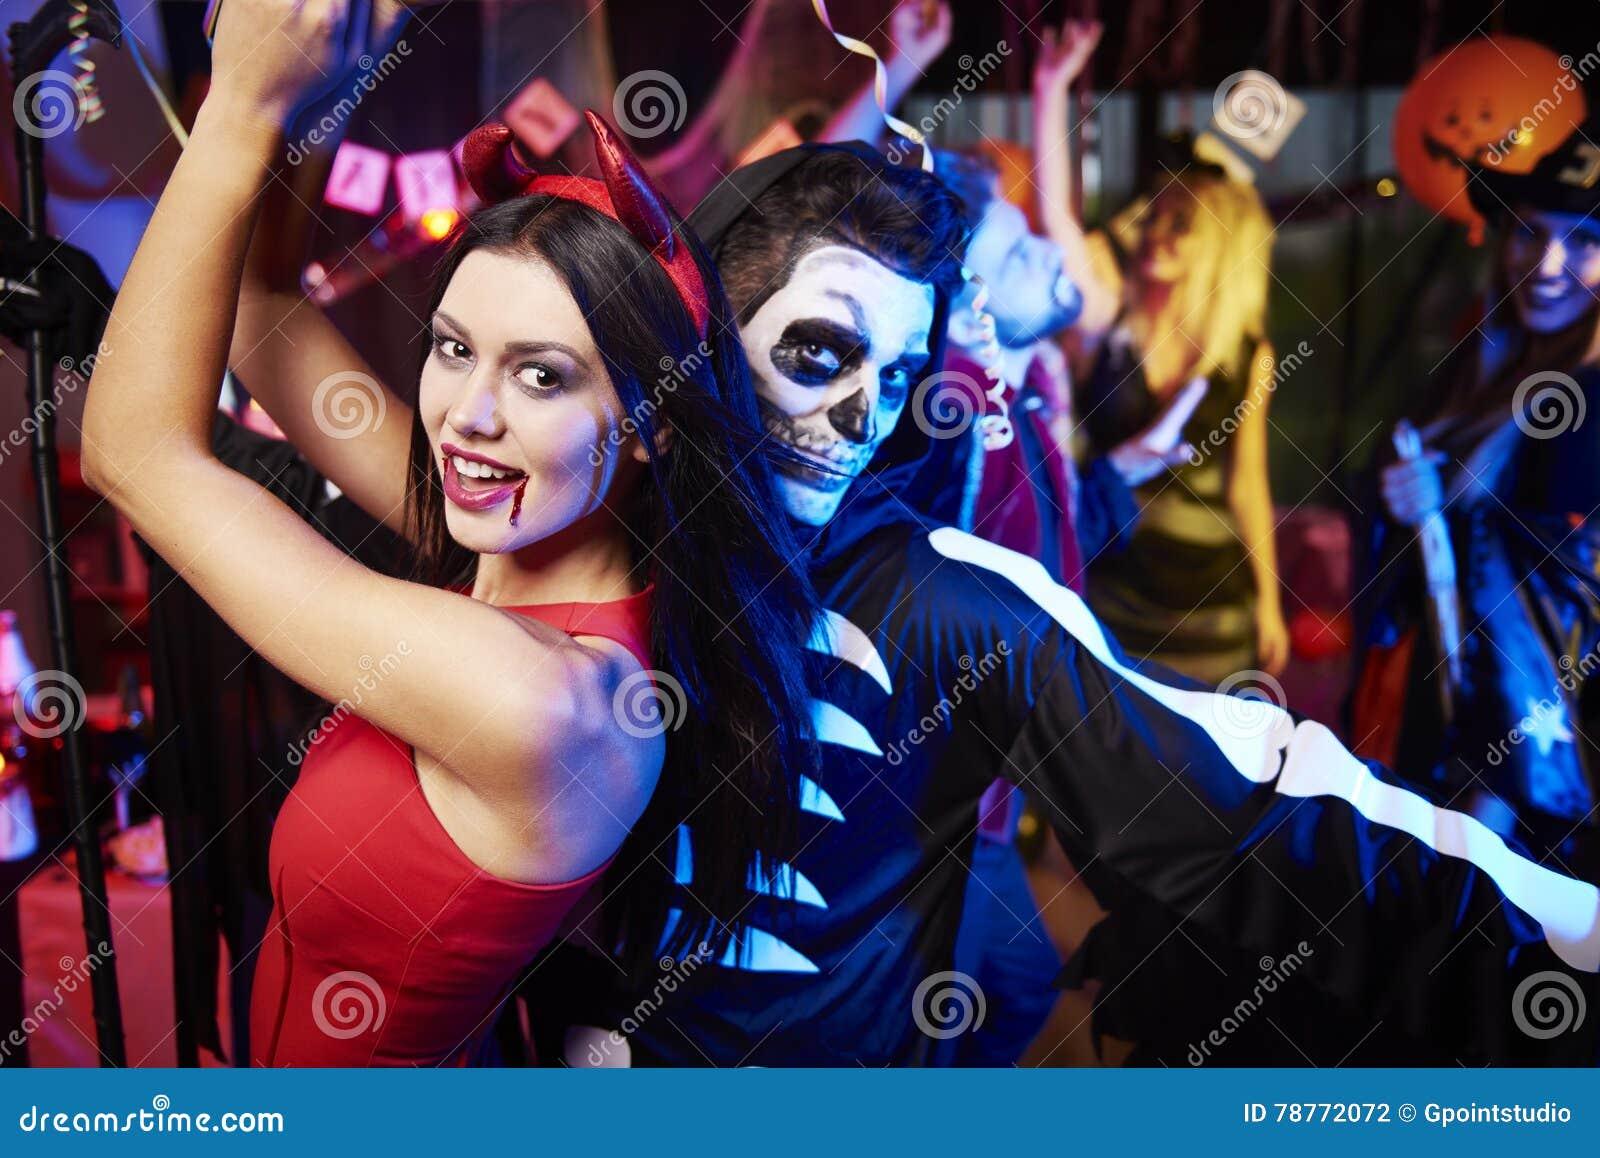 Halloween Party Stock Photo - Image: 78772072